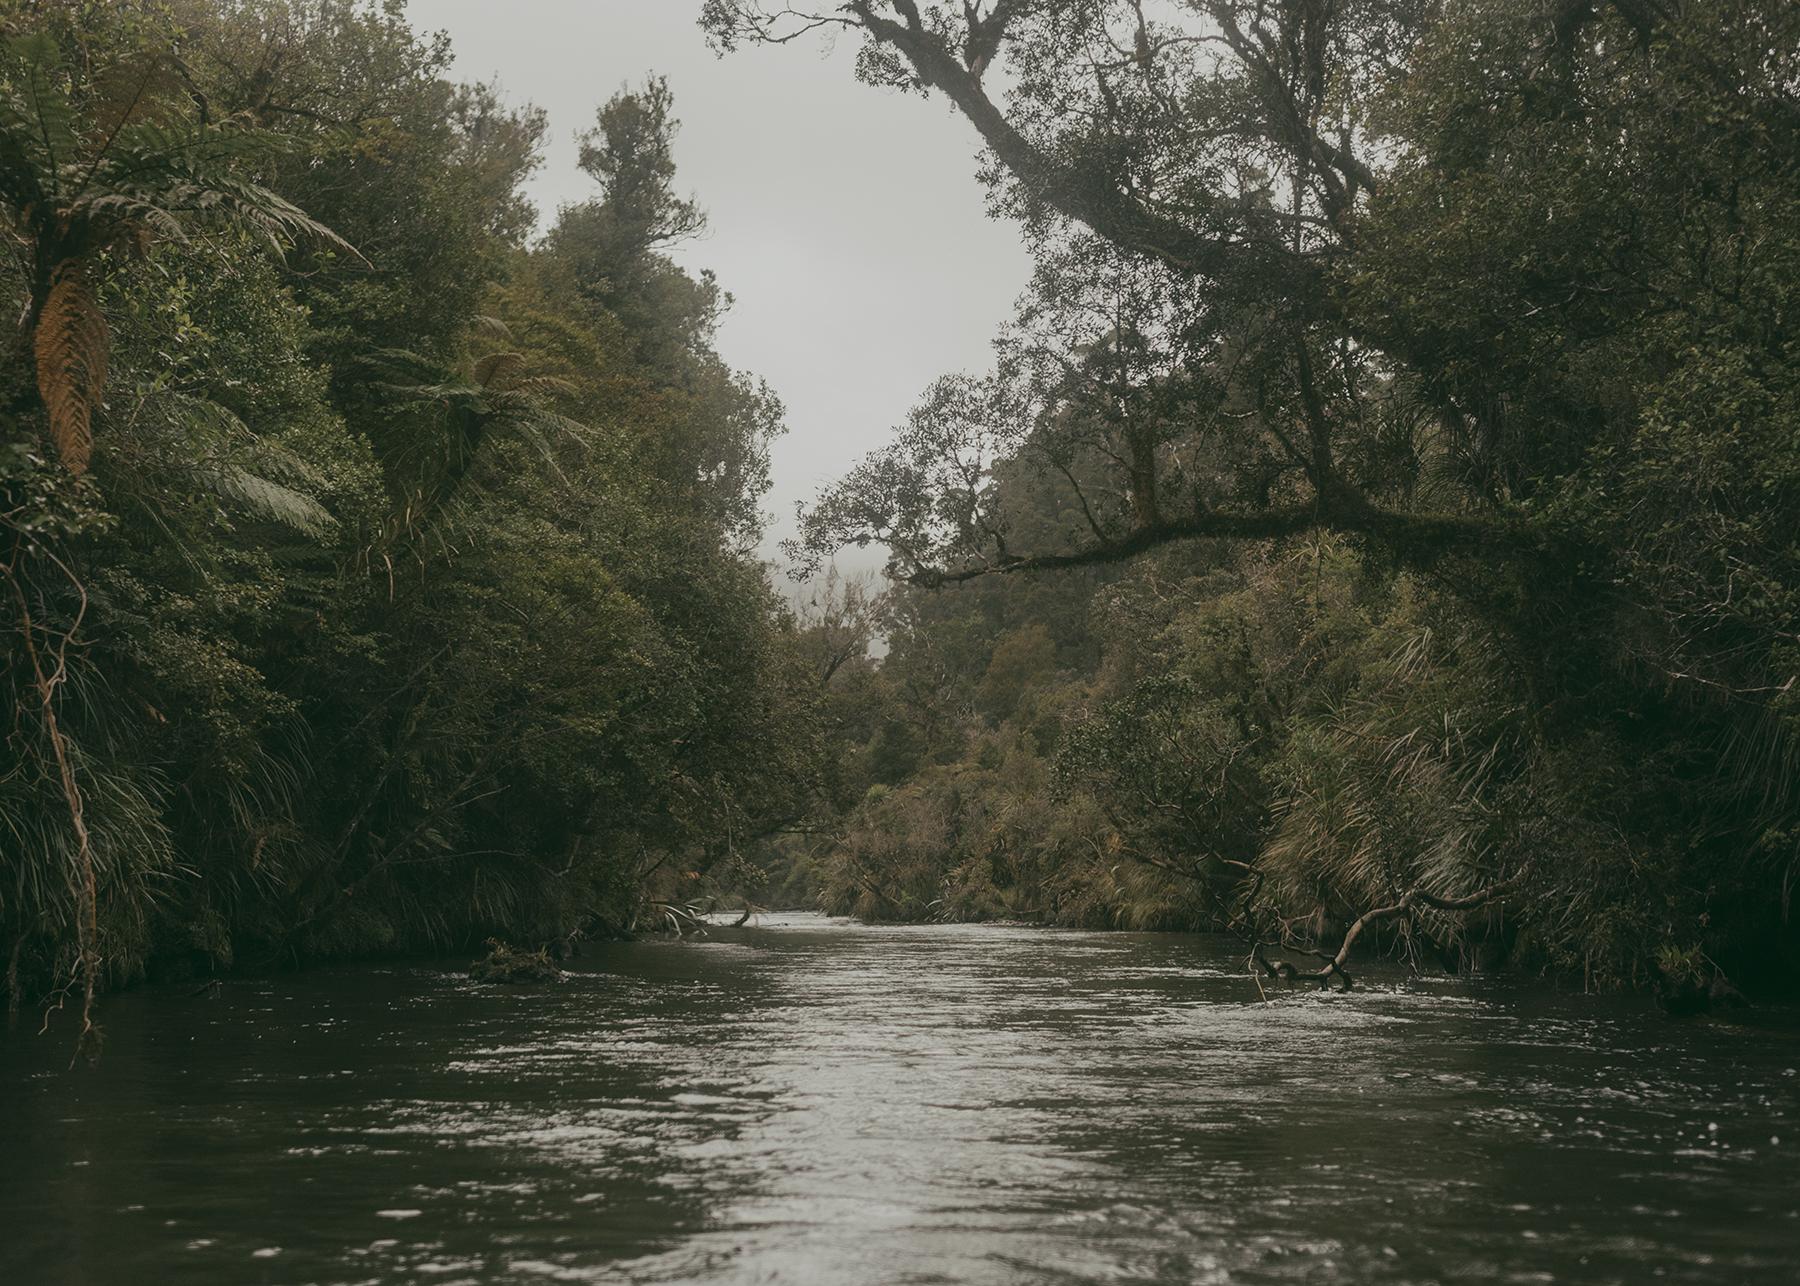 River 2 (without Chris paddling).jpg